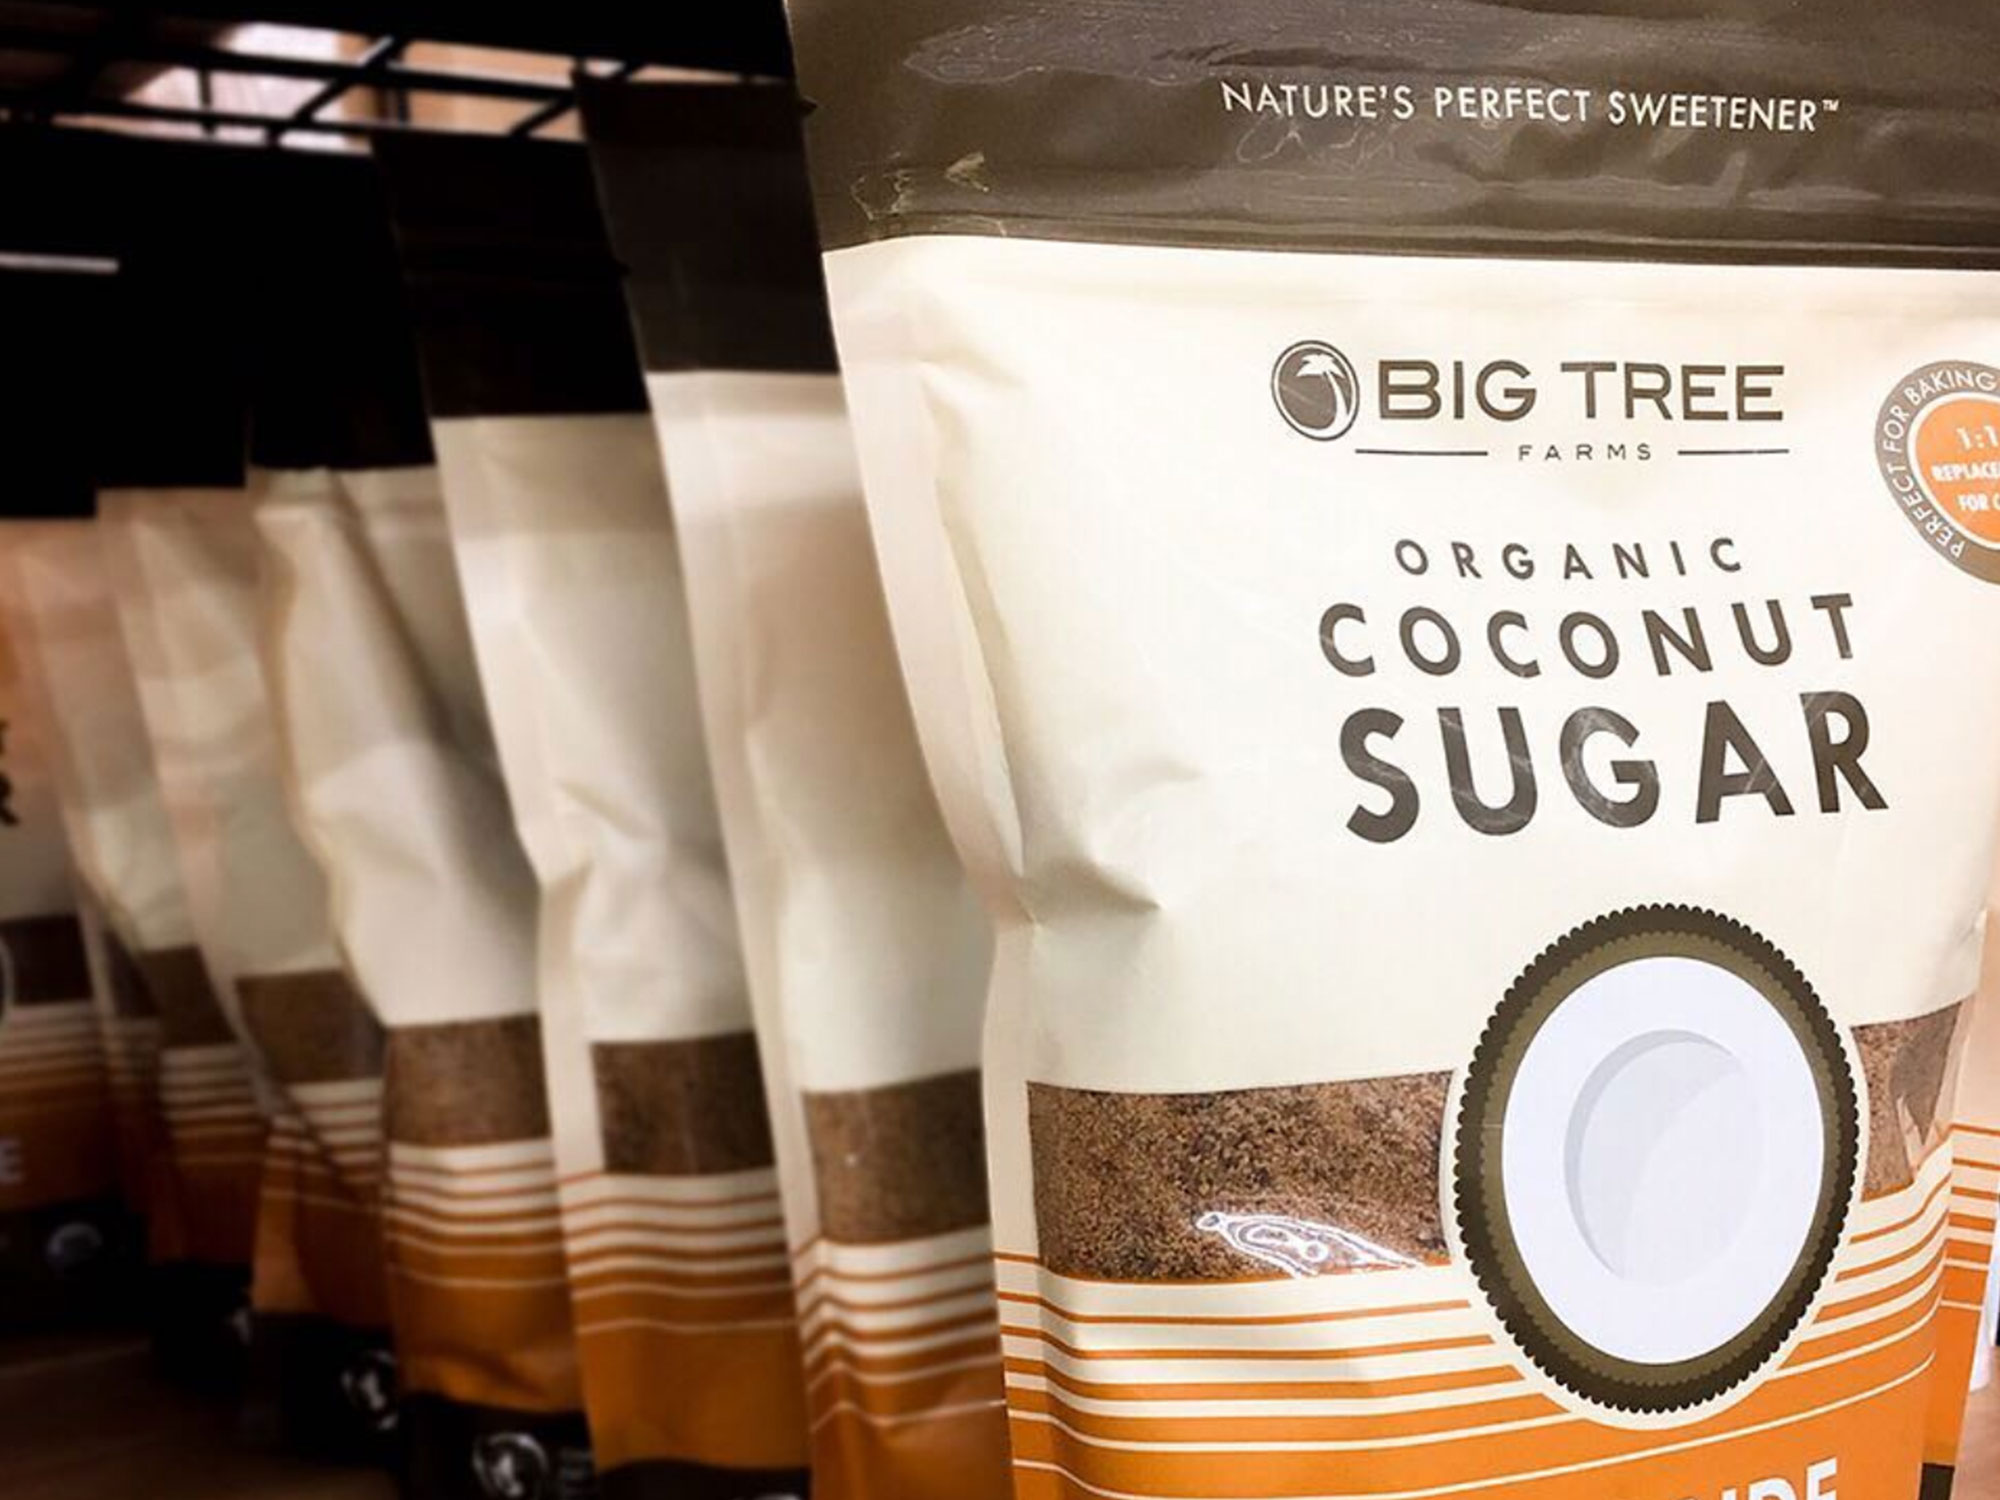 Are Coconut Sugar and Date Sugar 'Healthy' Sugars?